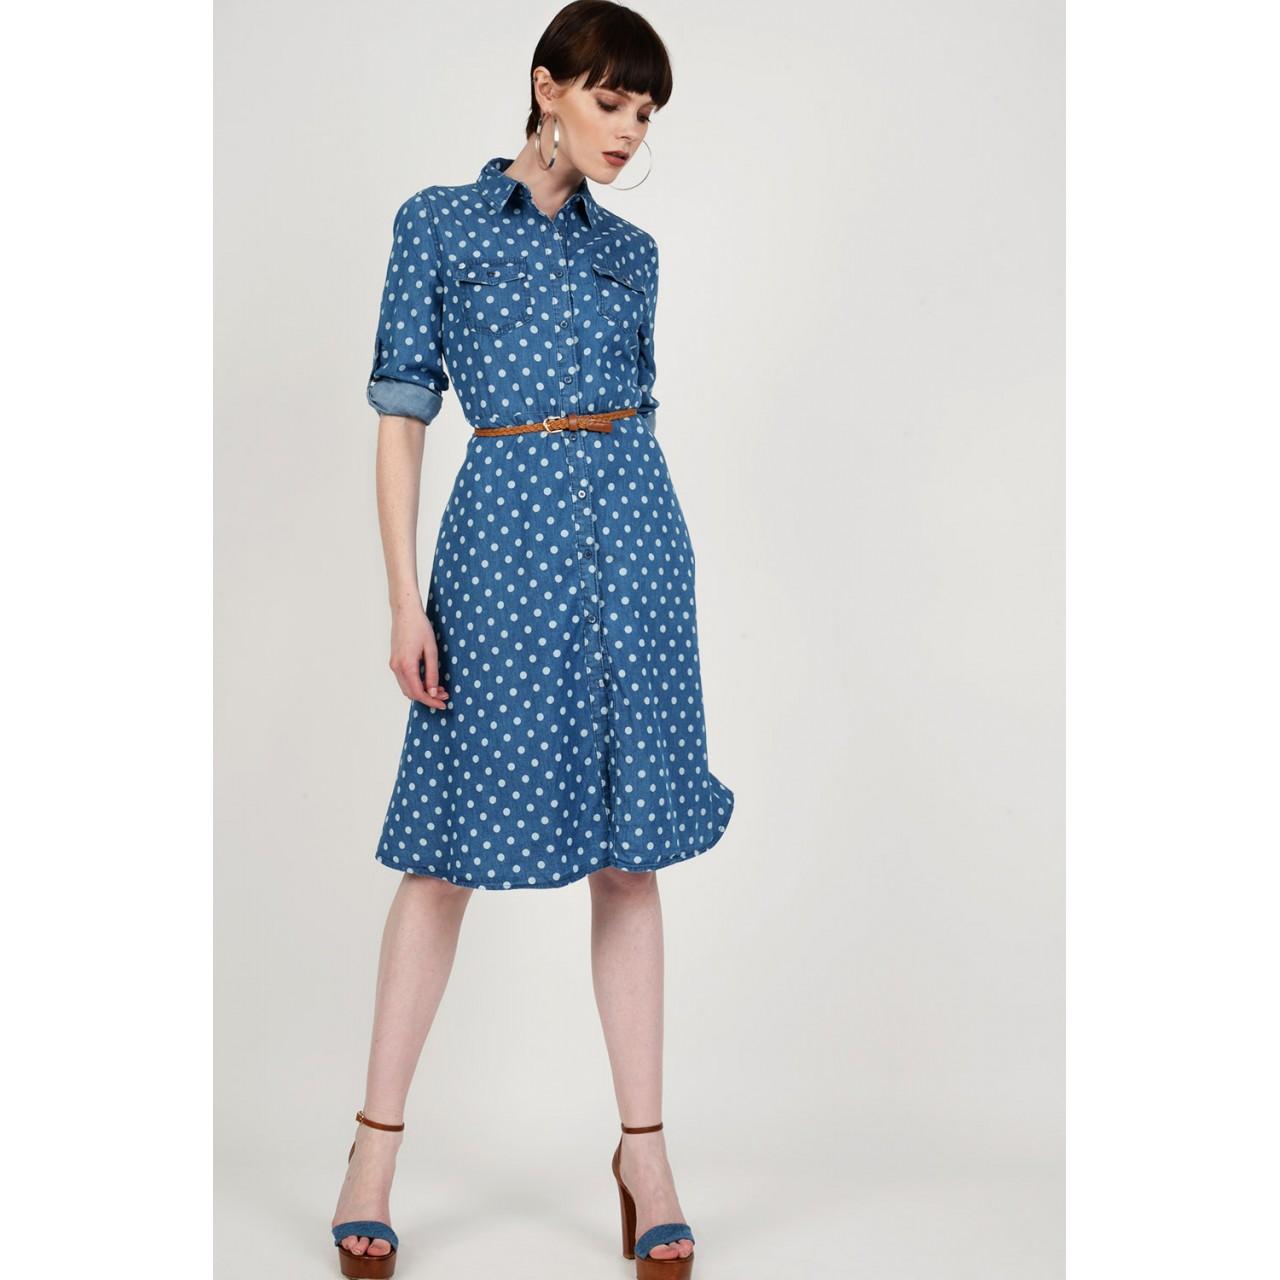 3ca57ea33147 Φόρεμα jean midi πουά με ζώνη